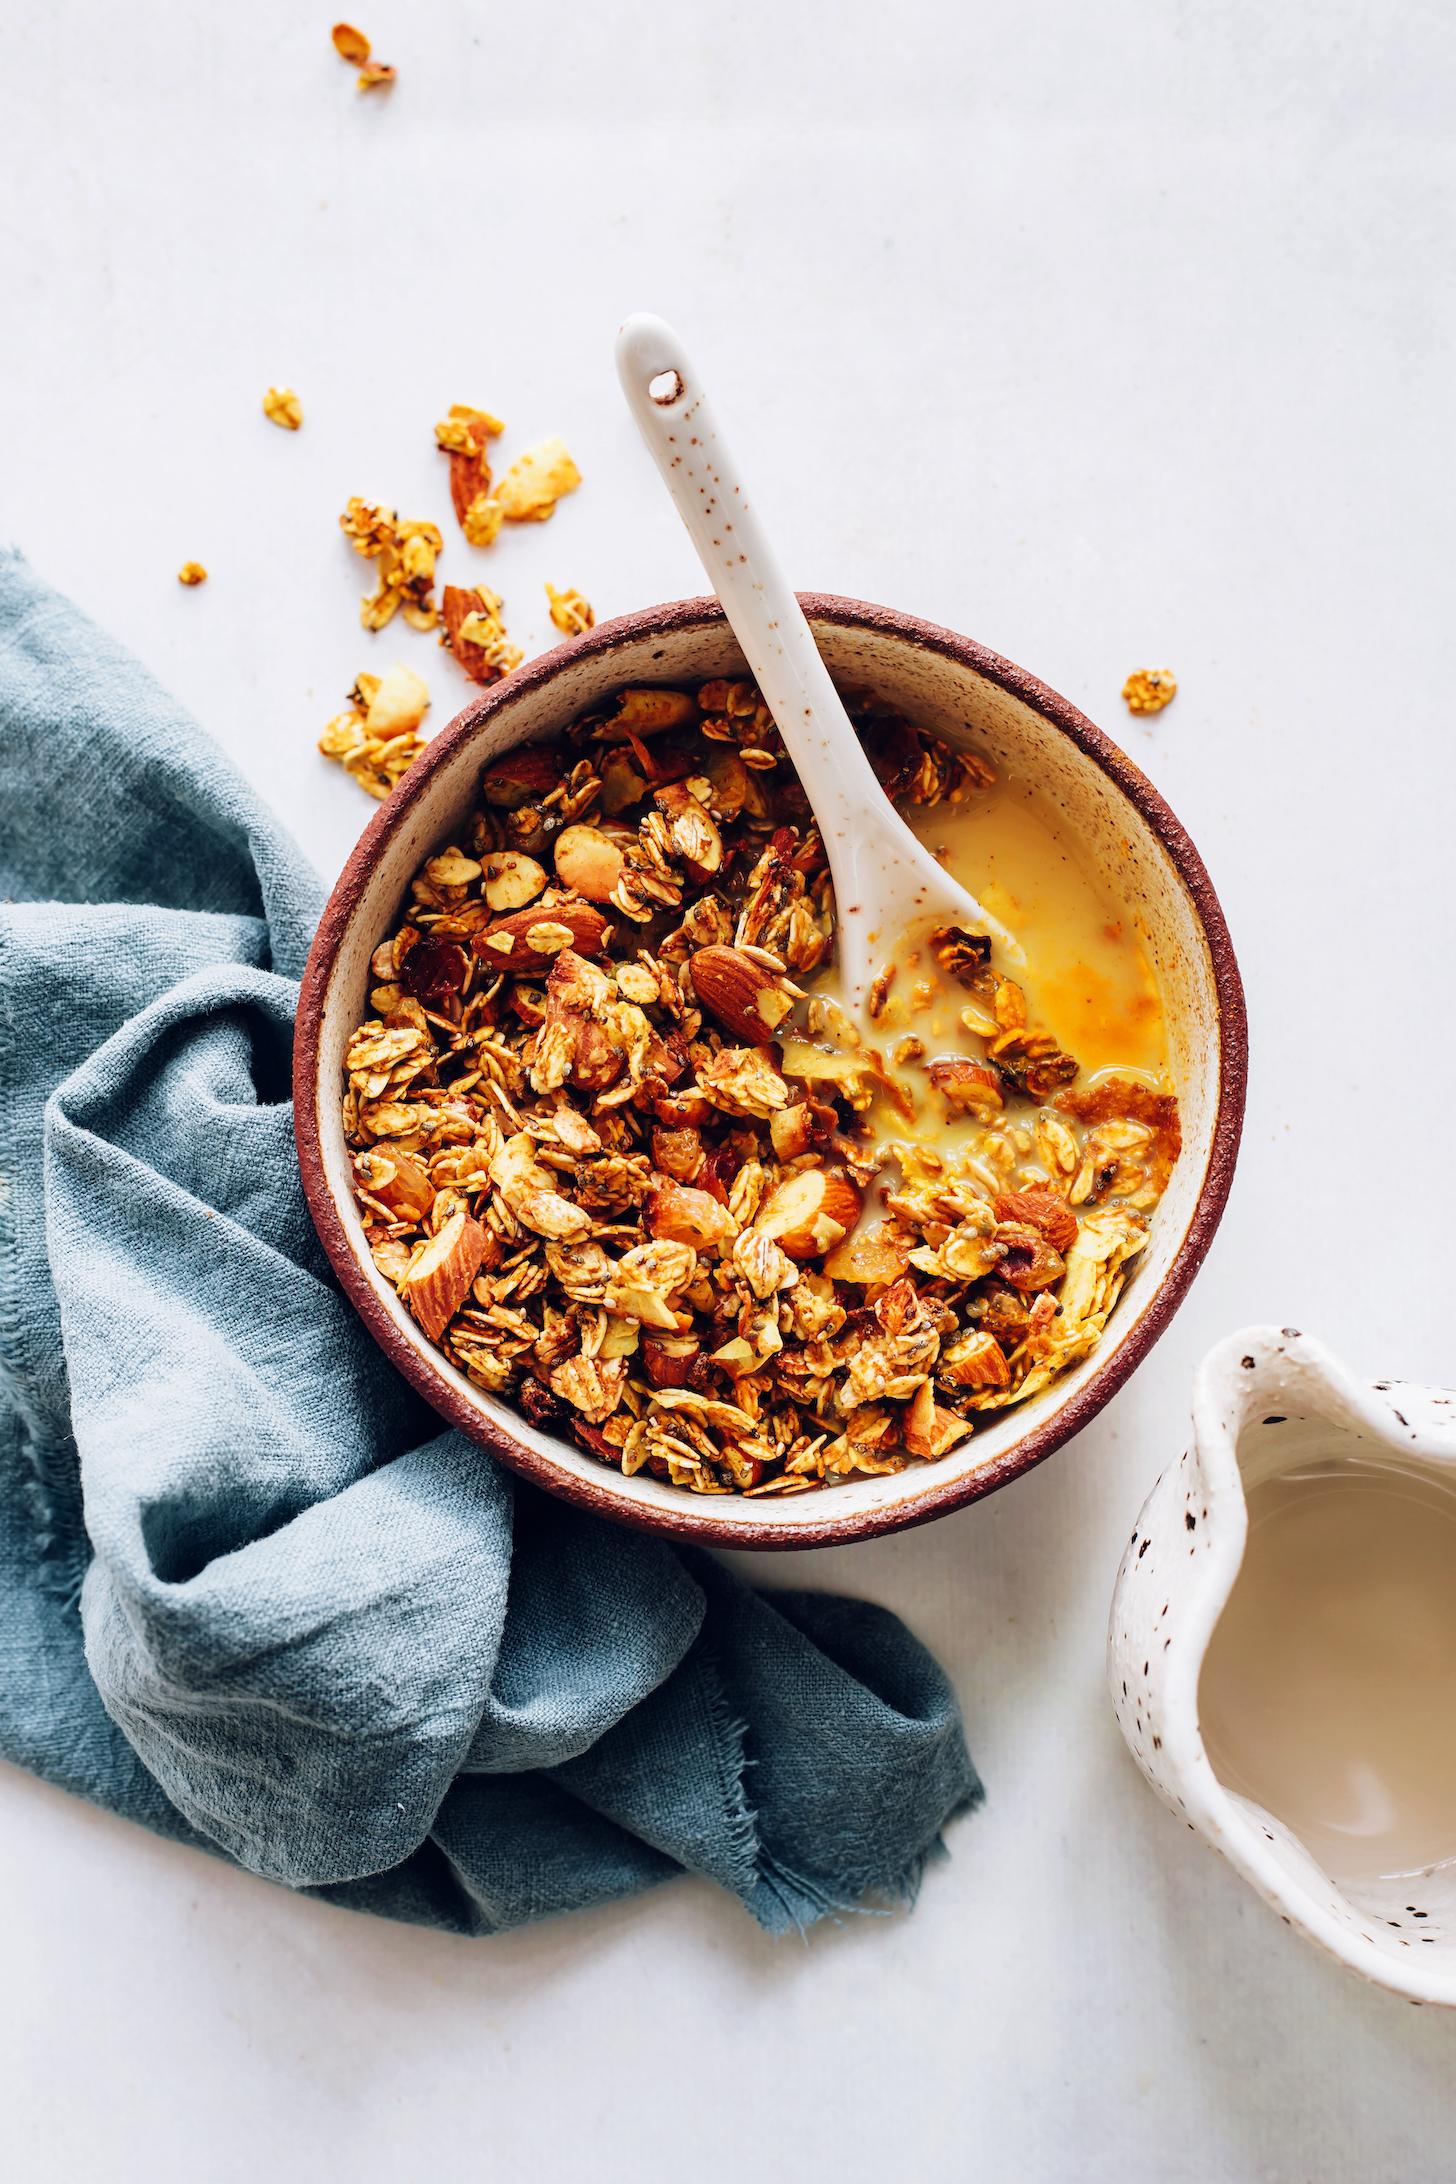 Spoon in a bowl of golden milk granola